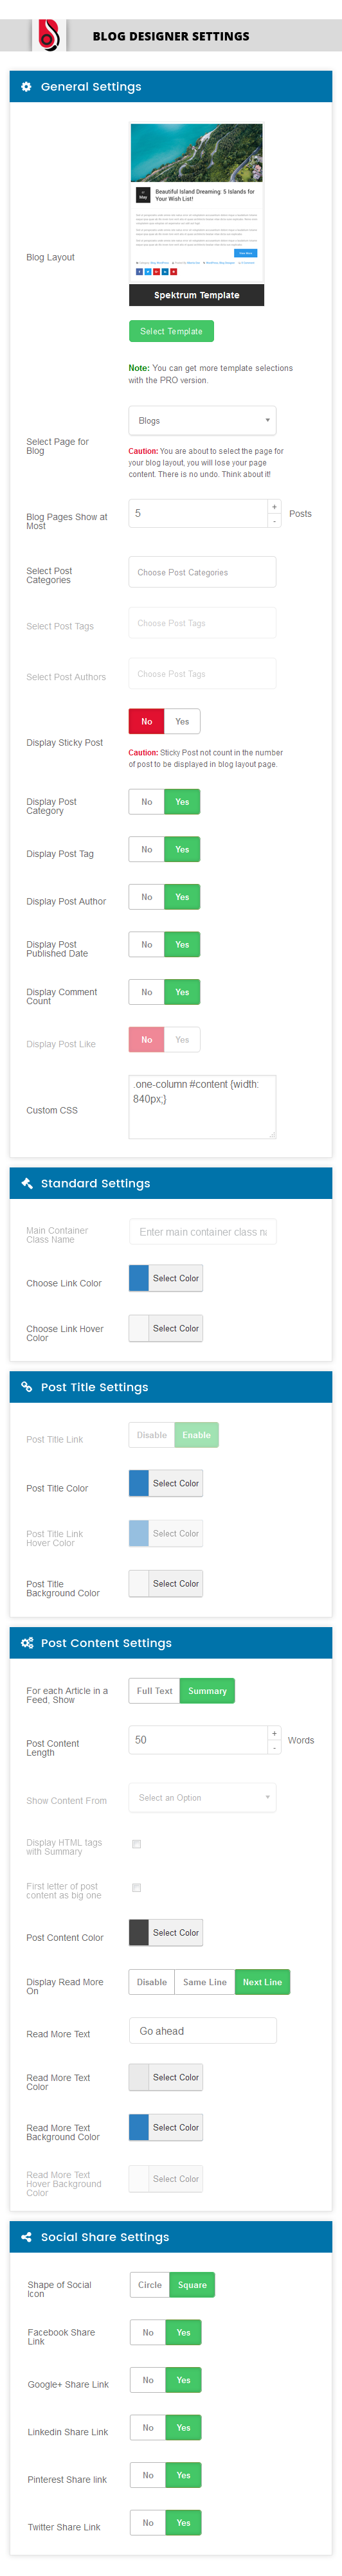 Blog Designer Panel - Admin Interface